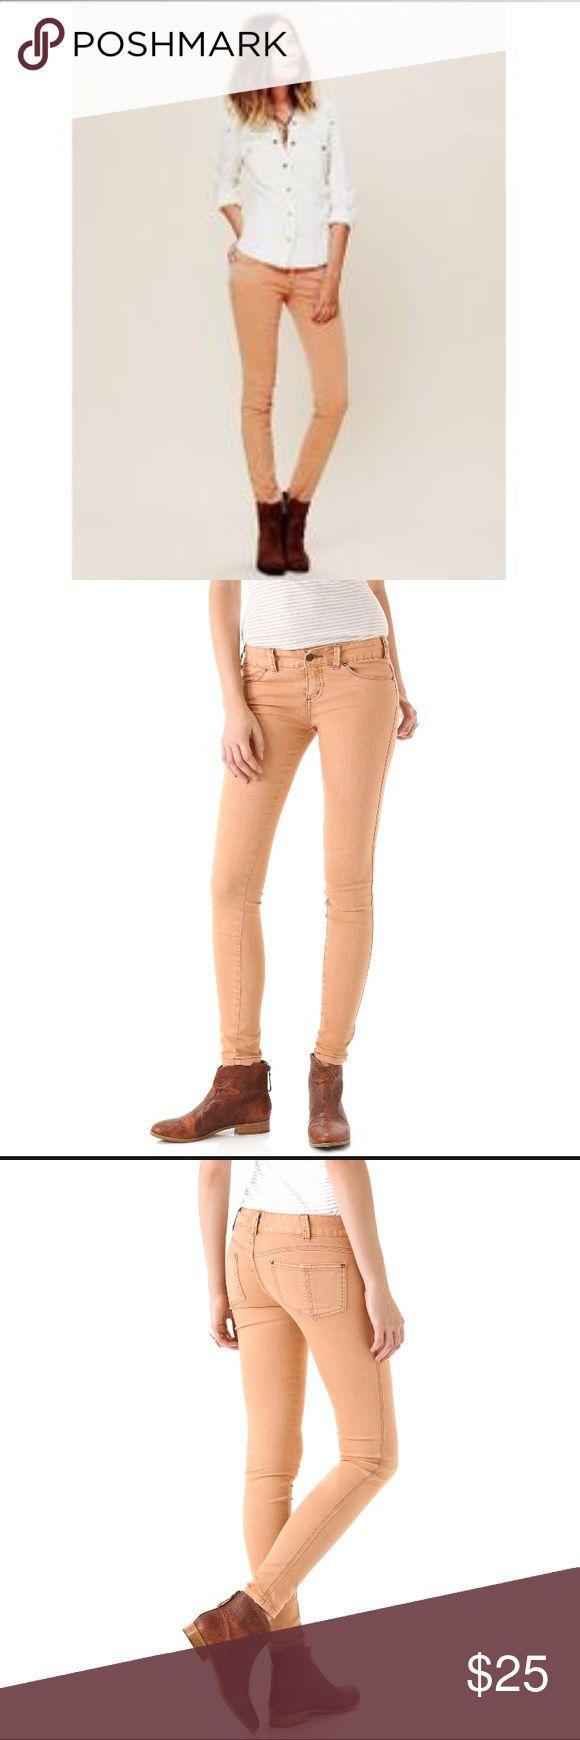 Free People Millennium Colored skinny jeans Free People Millennium Colored skinny jeans in peach/pink Free People Jeans Skinny